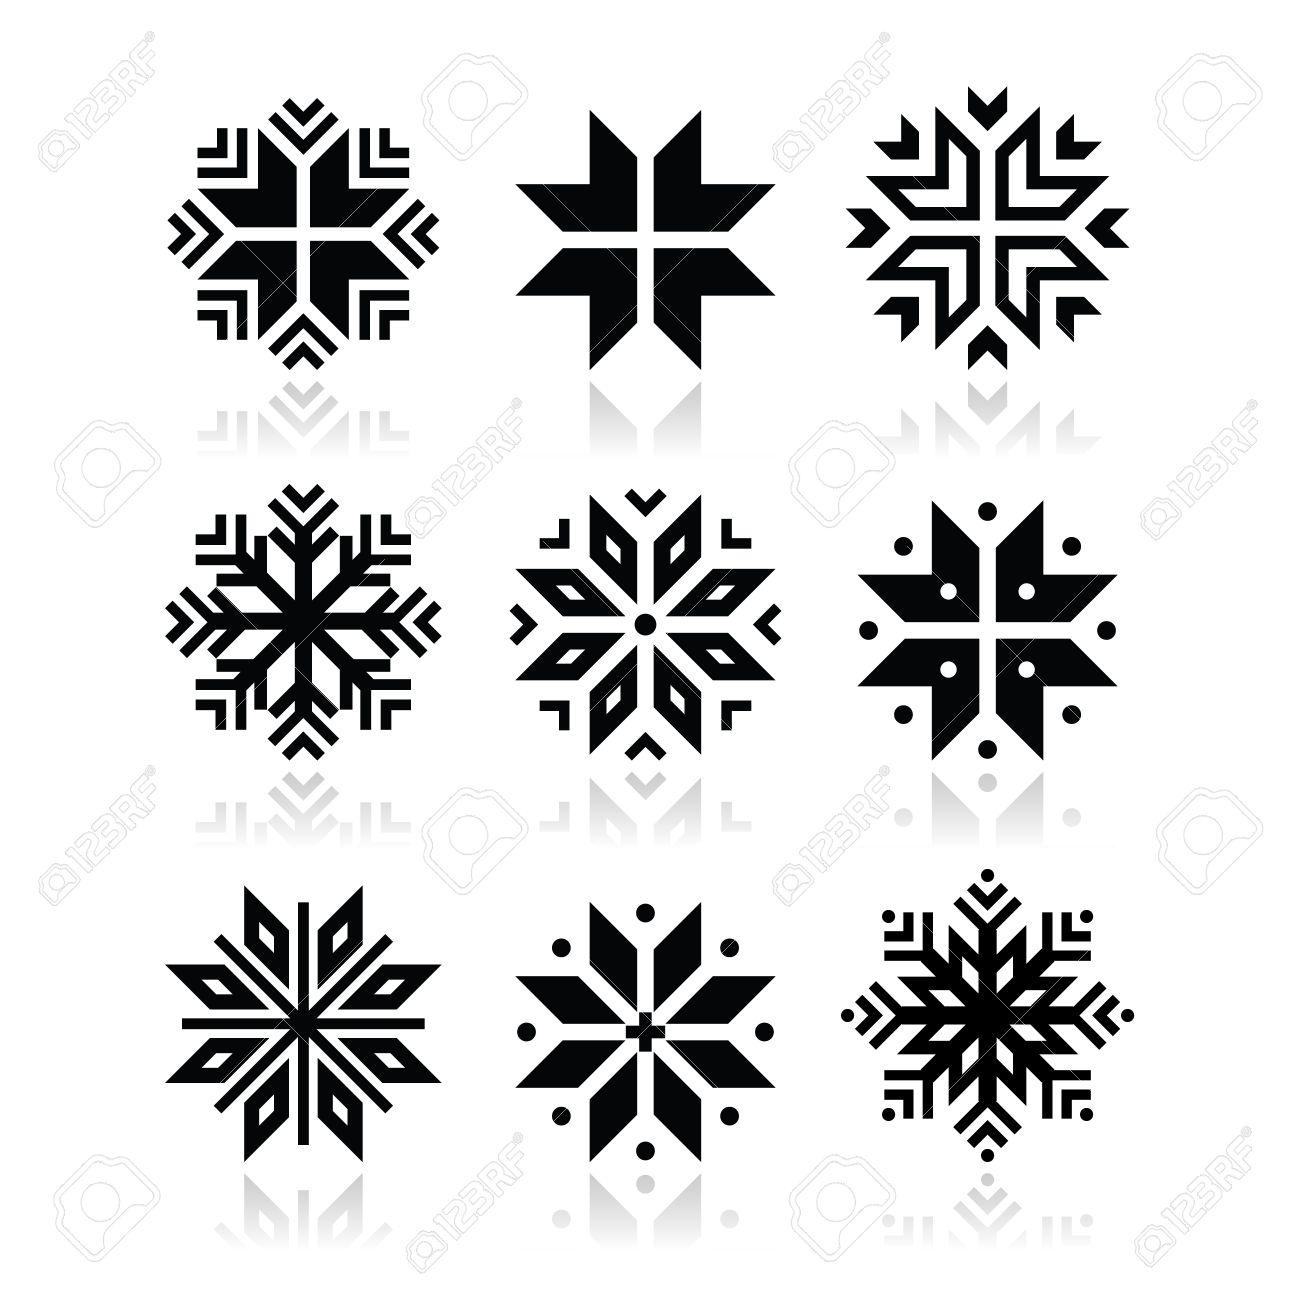 christmas winter snowflakes vector icons set royalty free cliparts rh 123rf com snowflakes vector free snowflake vector file